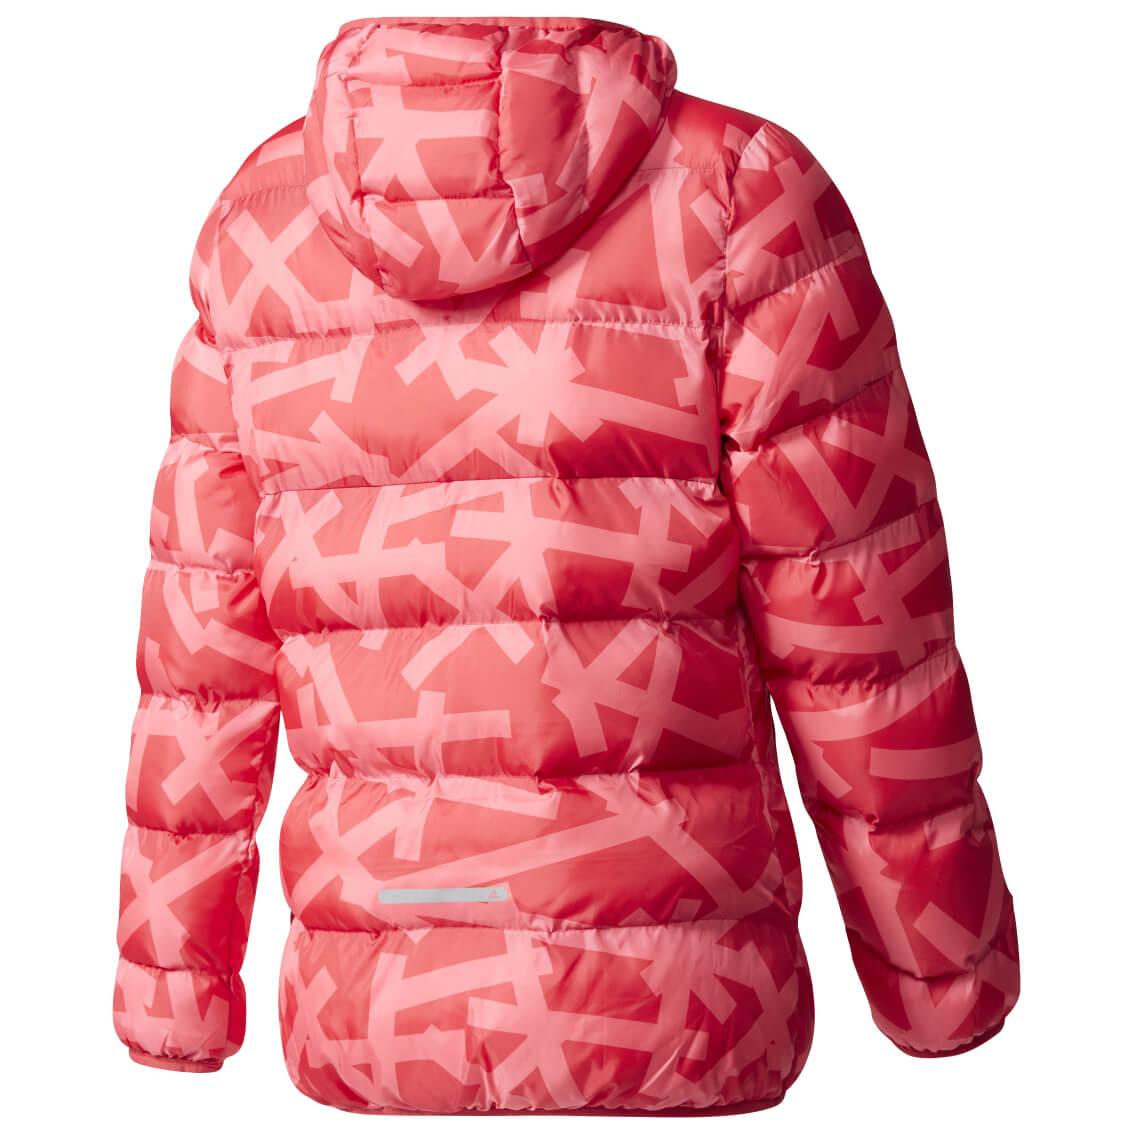 Adidas Synthetic Down BTS Jacket - Winterjacke Mädchen online kaufen ...